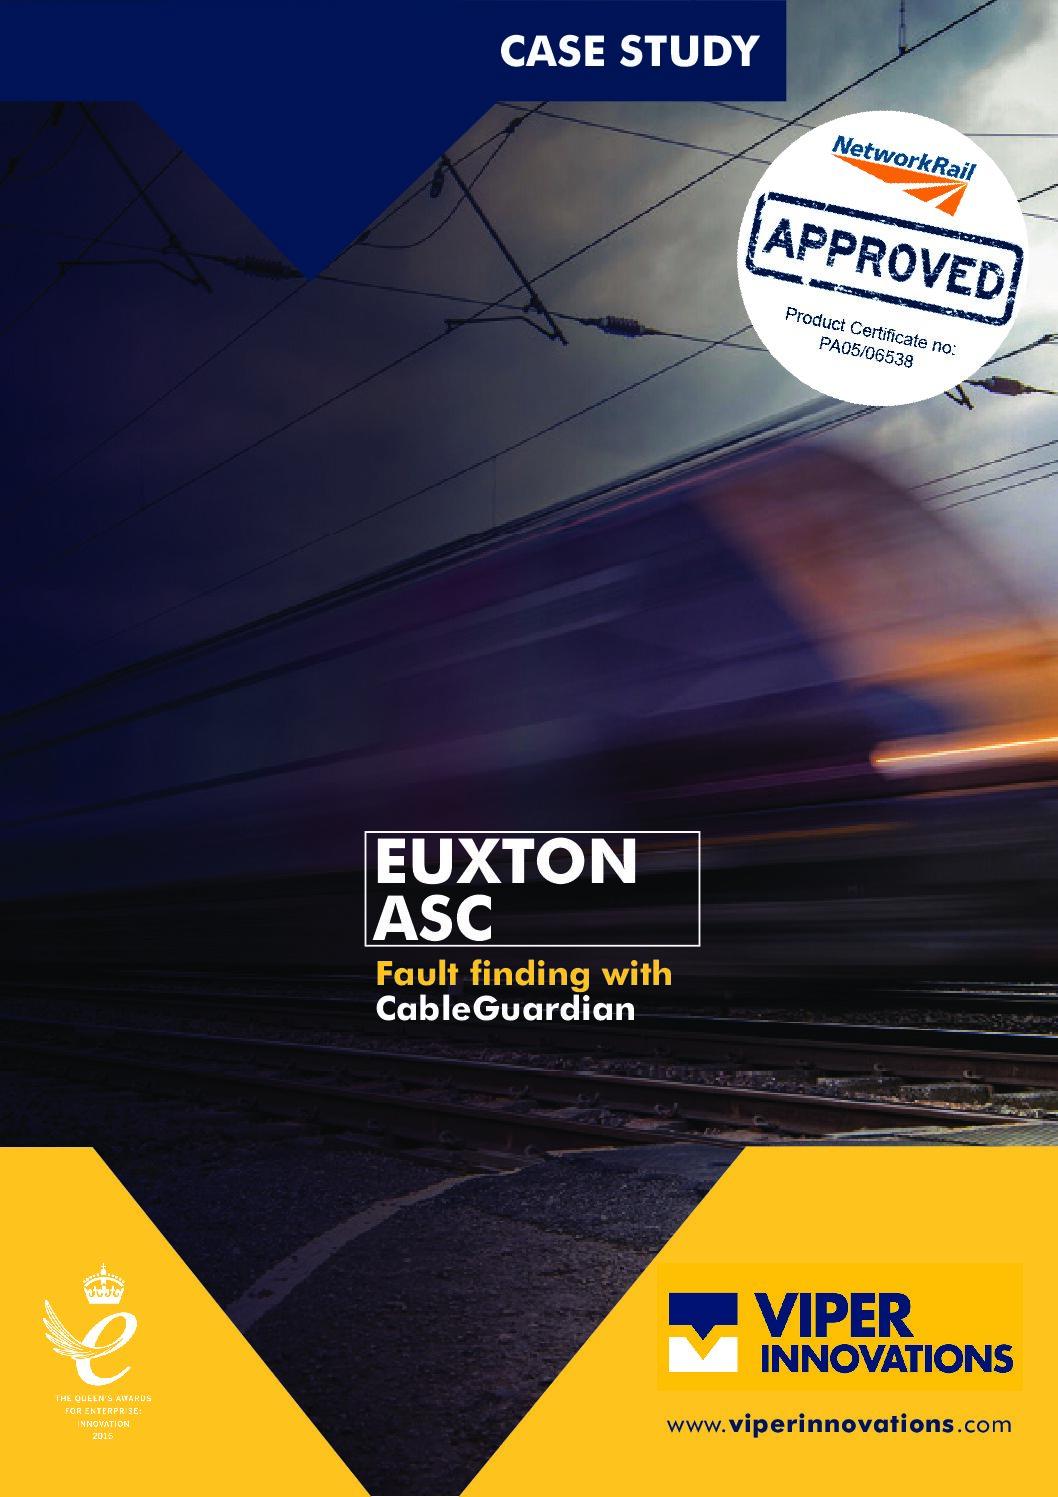 CableGuardian Euxton ASC Case Study